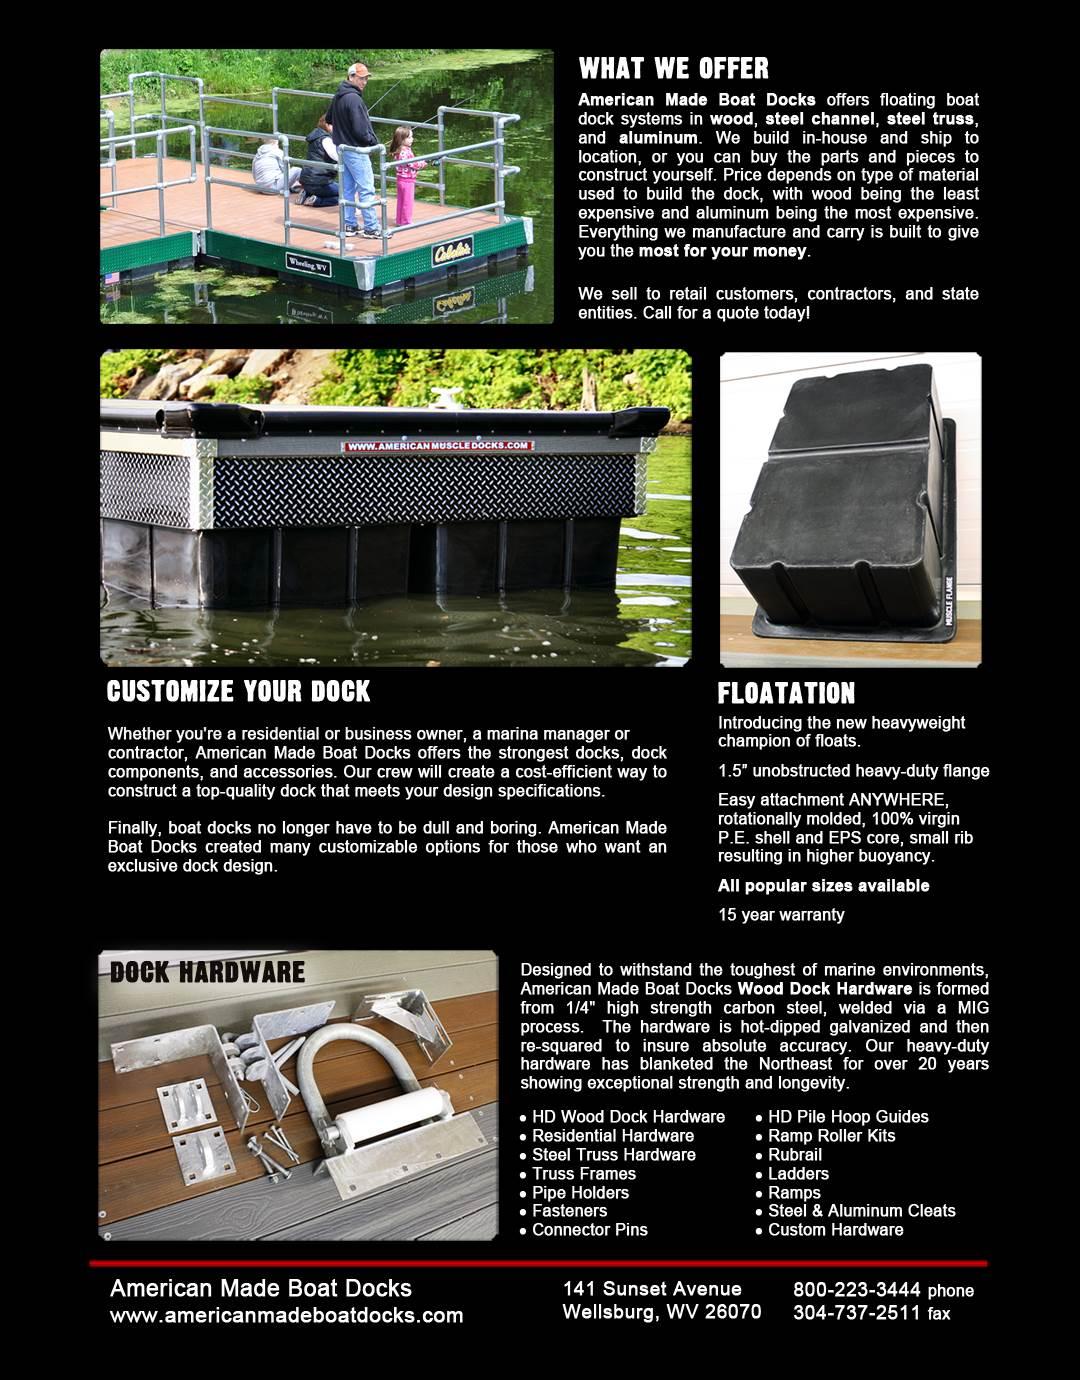 American Muscle Docks & Fabrication-Wellsburg-WV-26070